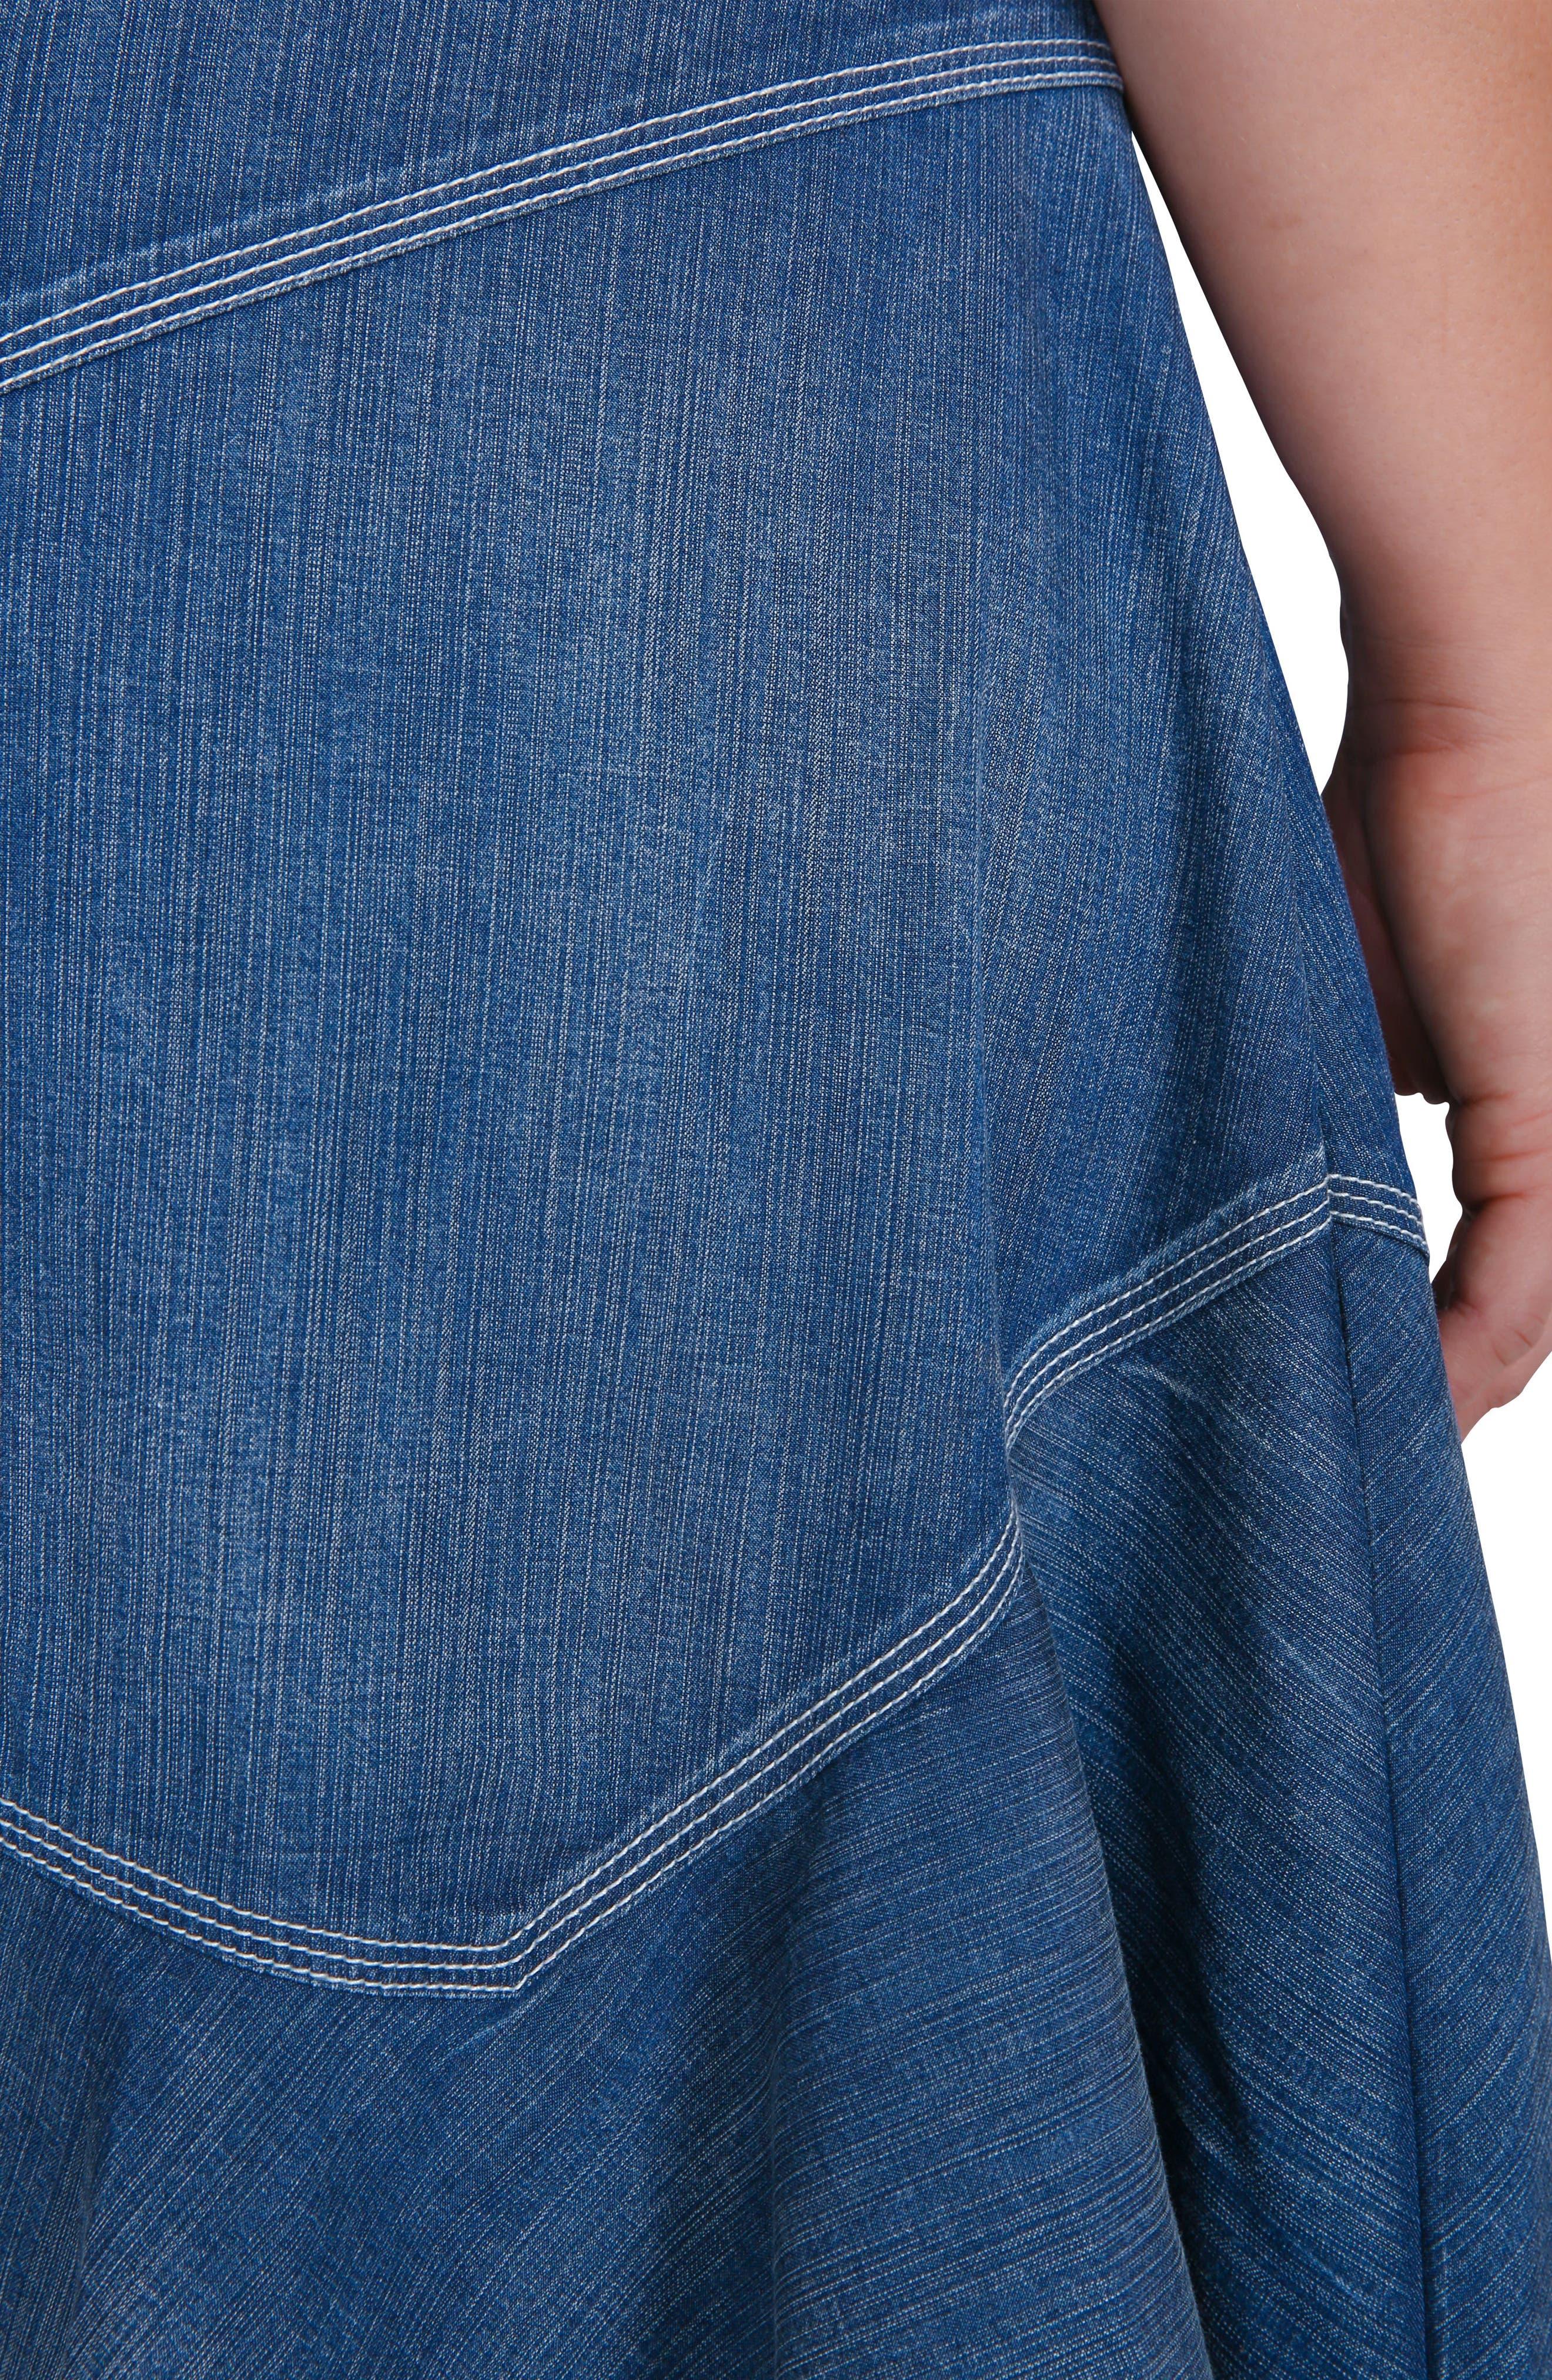 Rosie Denim Tank Dress,                             Alternate thumbnail 5, color,                             Enchanted Blue